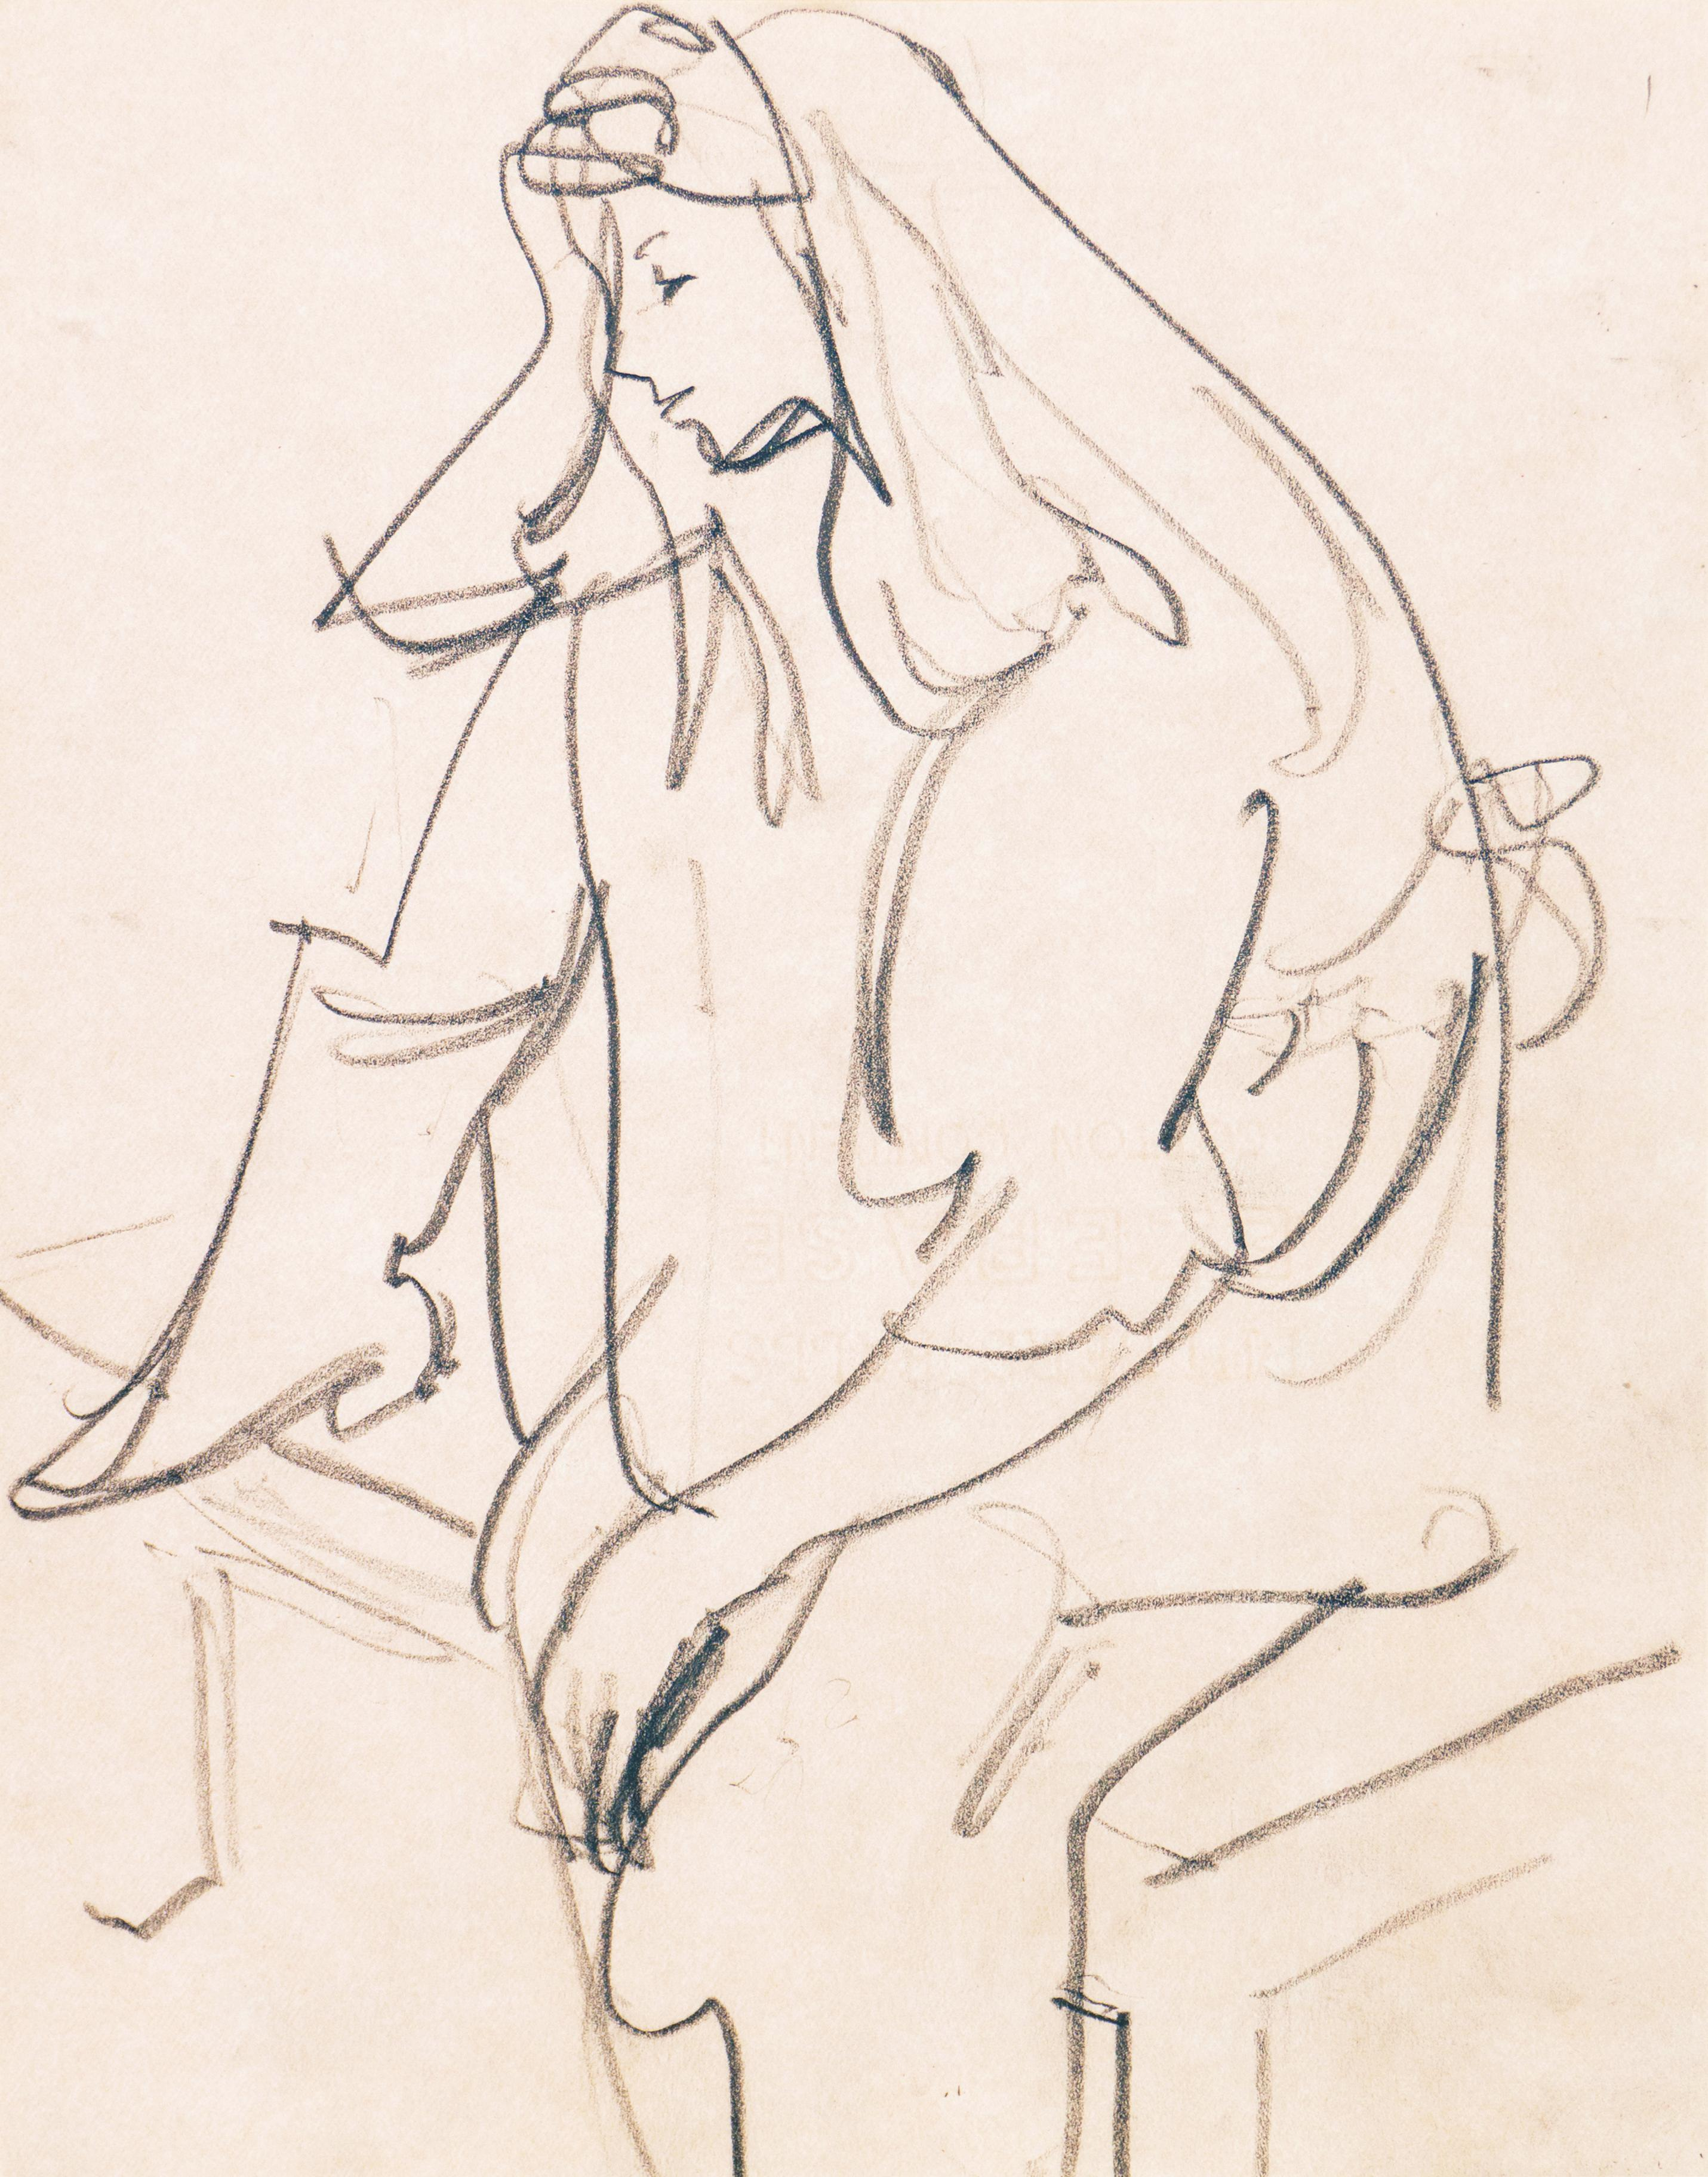 'Woman Seated', Carmel Artist, Louvre, Academie Chaumiere, Paris, SFAA, LACMA